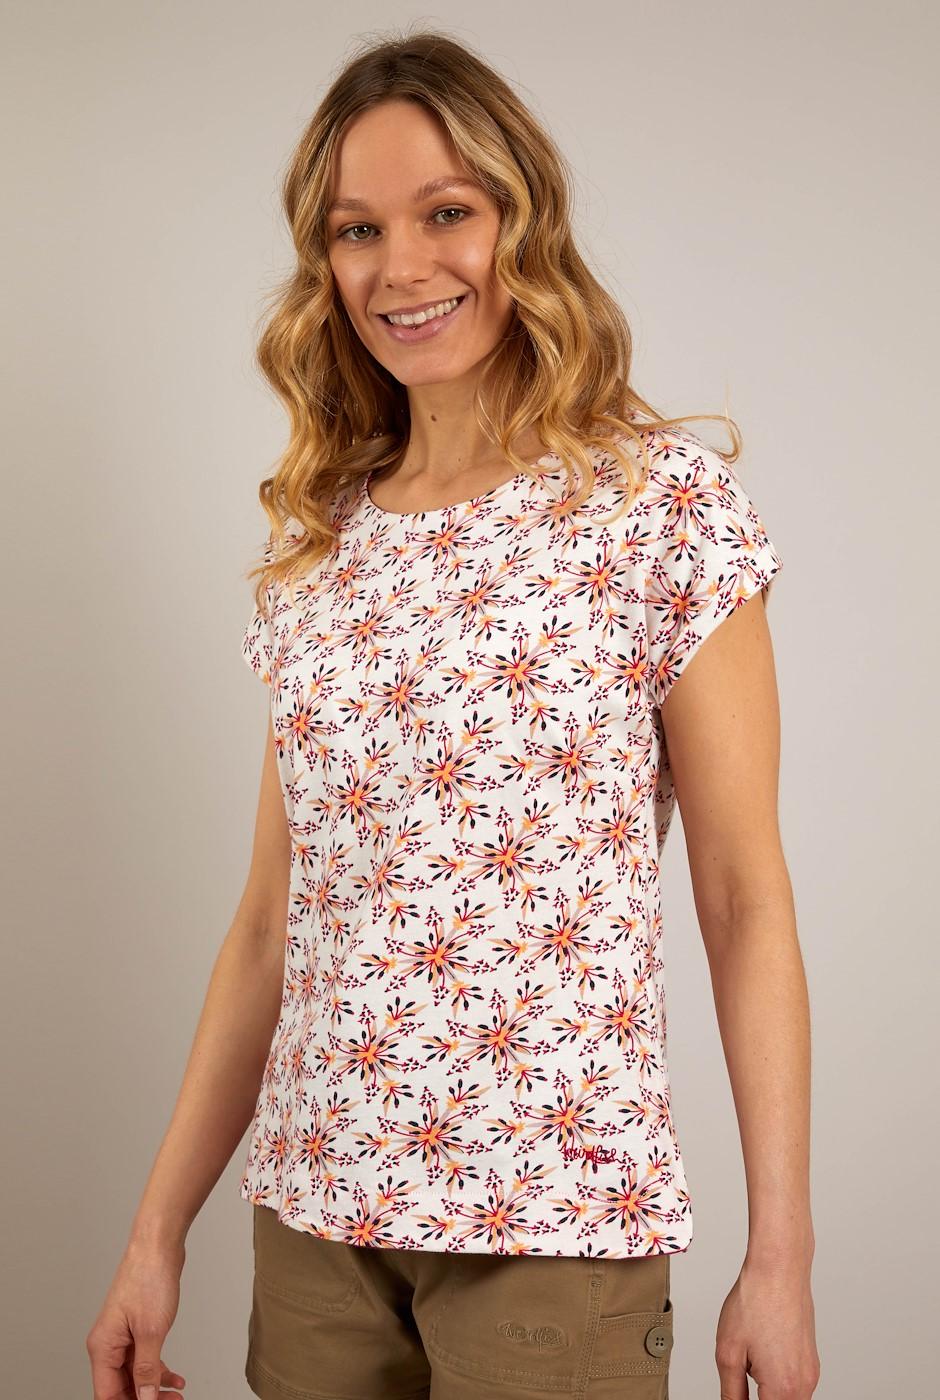 Paw Paw Organic Cotton Printed Jersey T-Shirt Light Cream